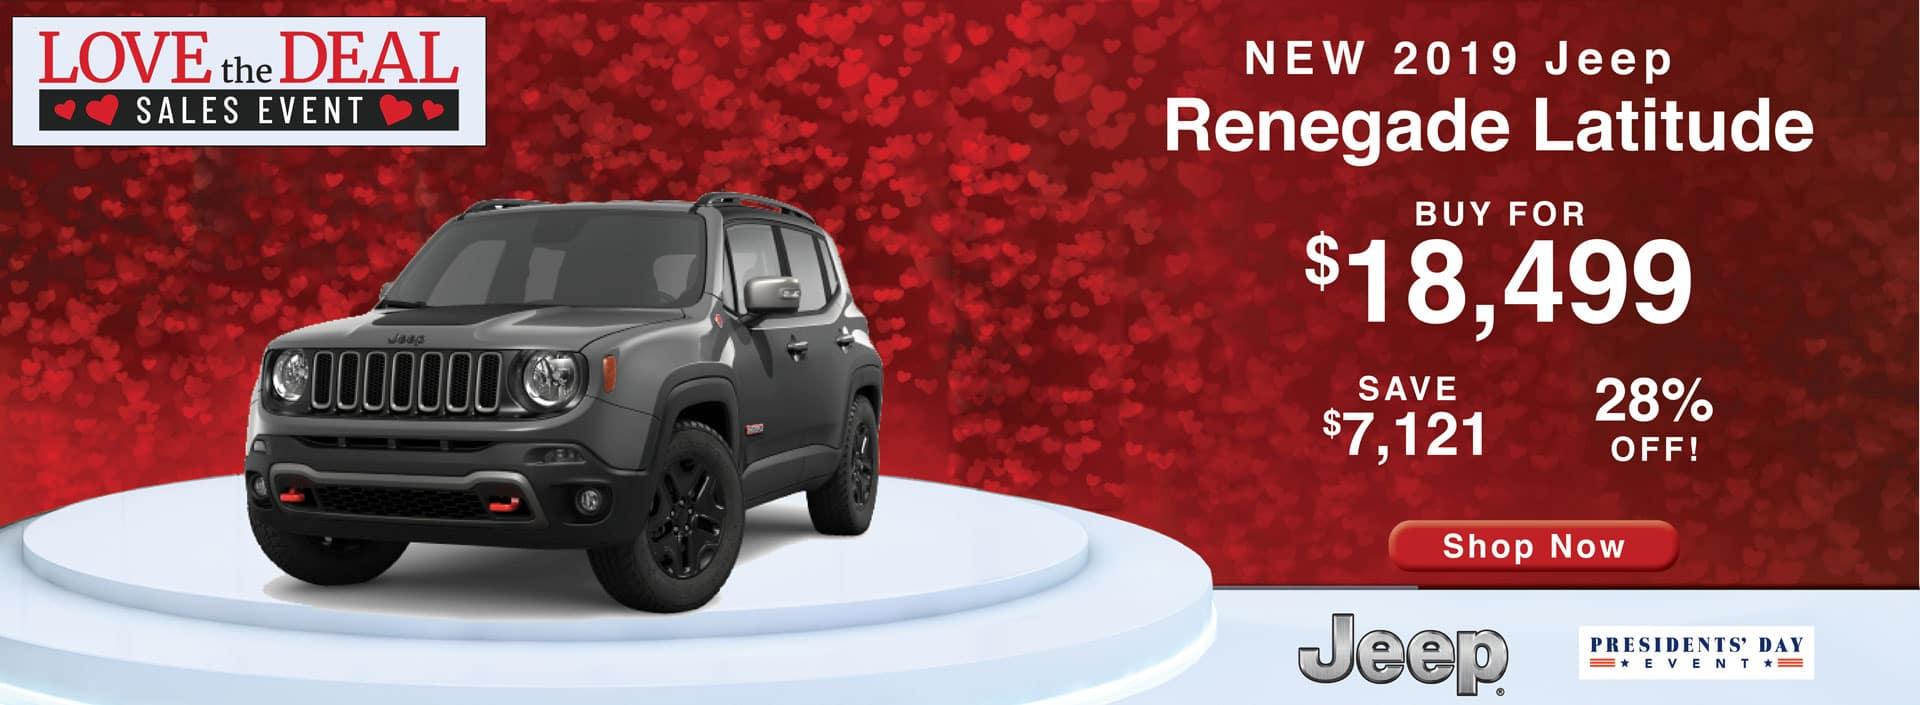 2019 Jeep-Renegade Latitude-18499